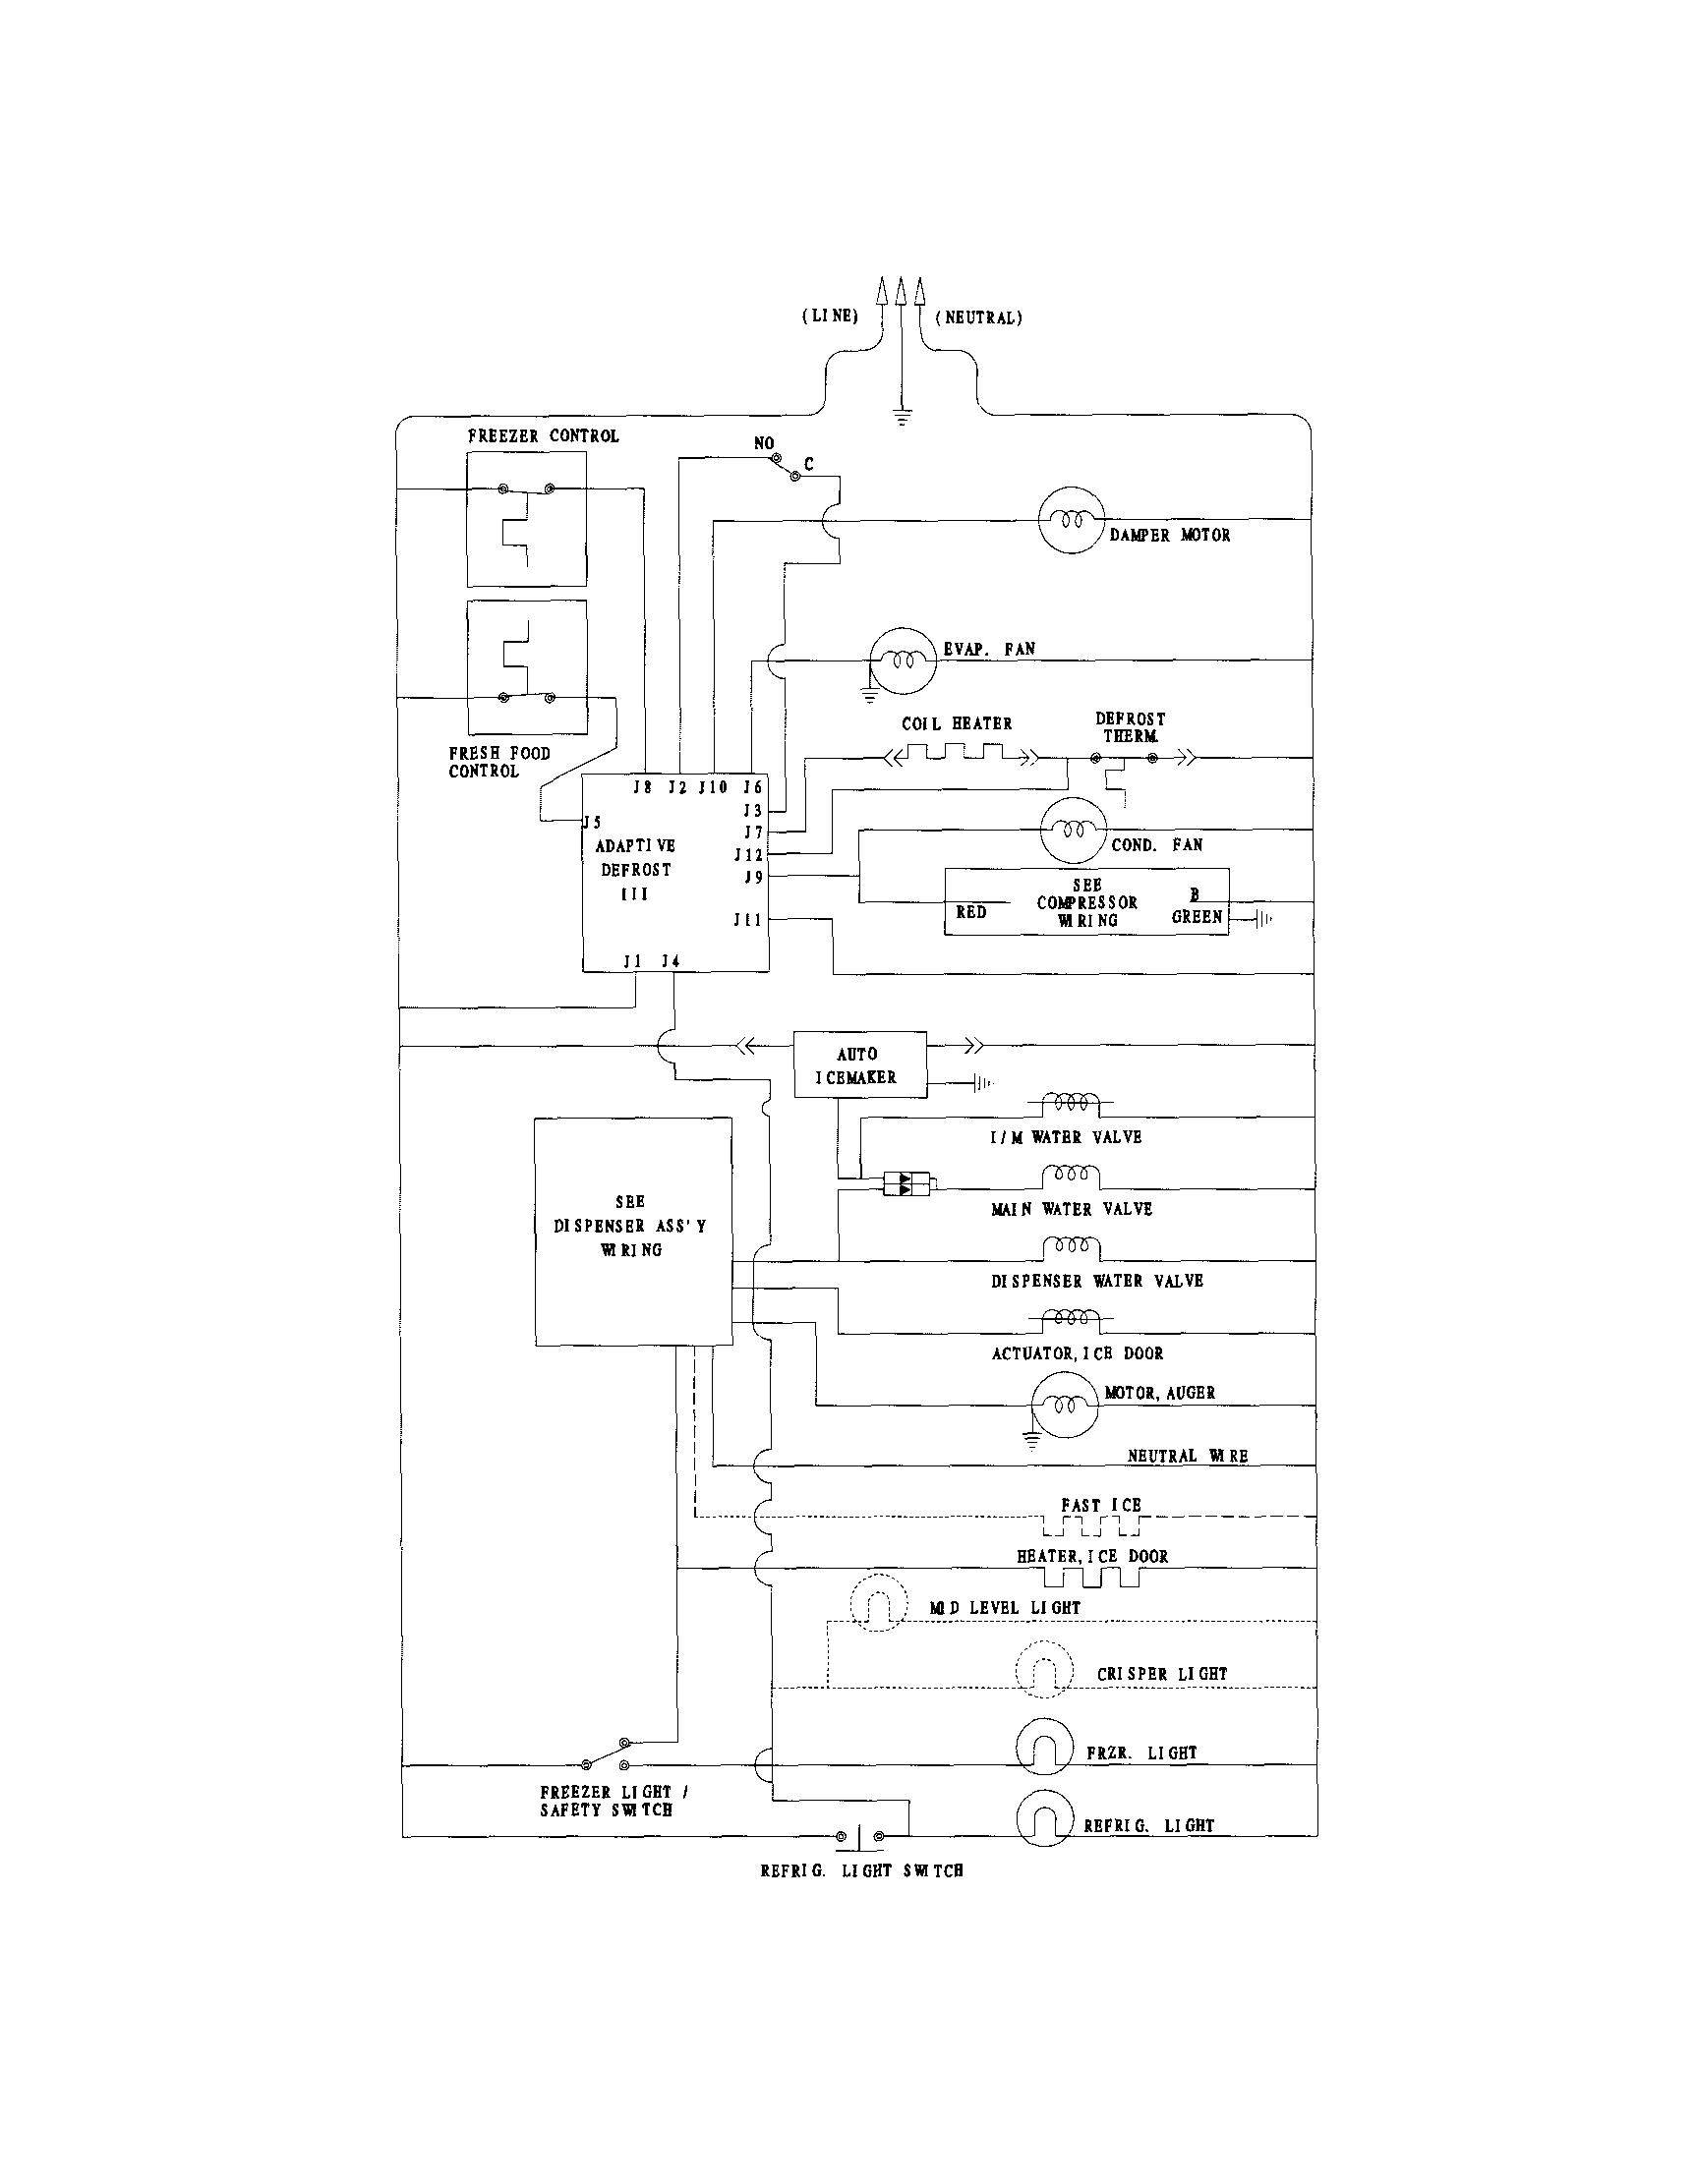 Sears kenmore refrigerator wiring diagram get free image 1000x1288